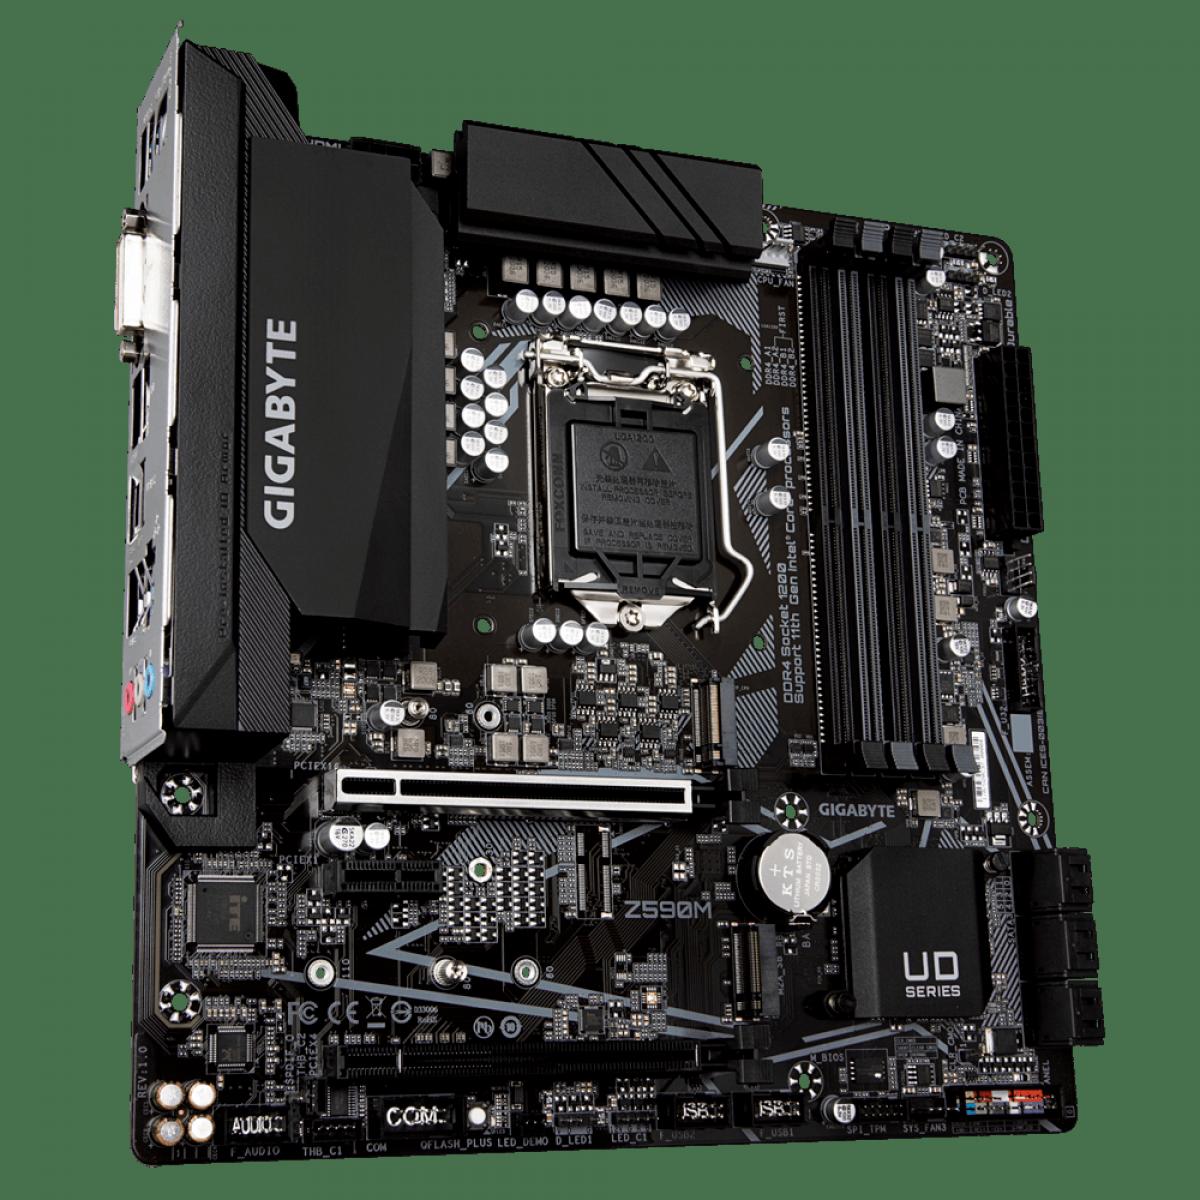 Placa Mãe GIGABYTE Z590M (rev. 1.0), Intel Z590 Express Chipset, Socket 1200, mATX, DDR4